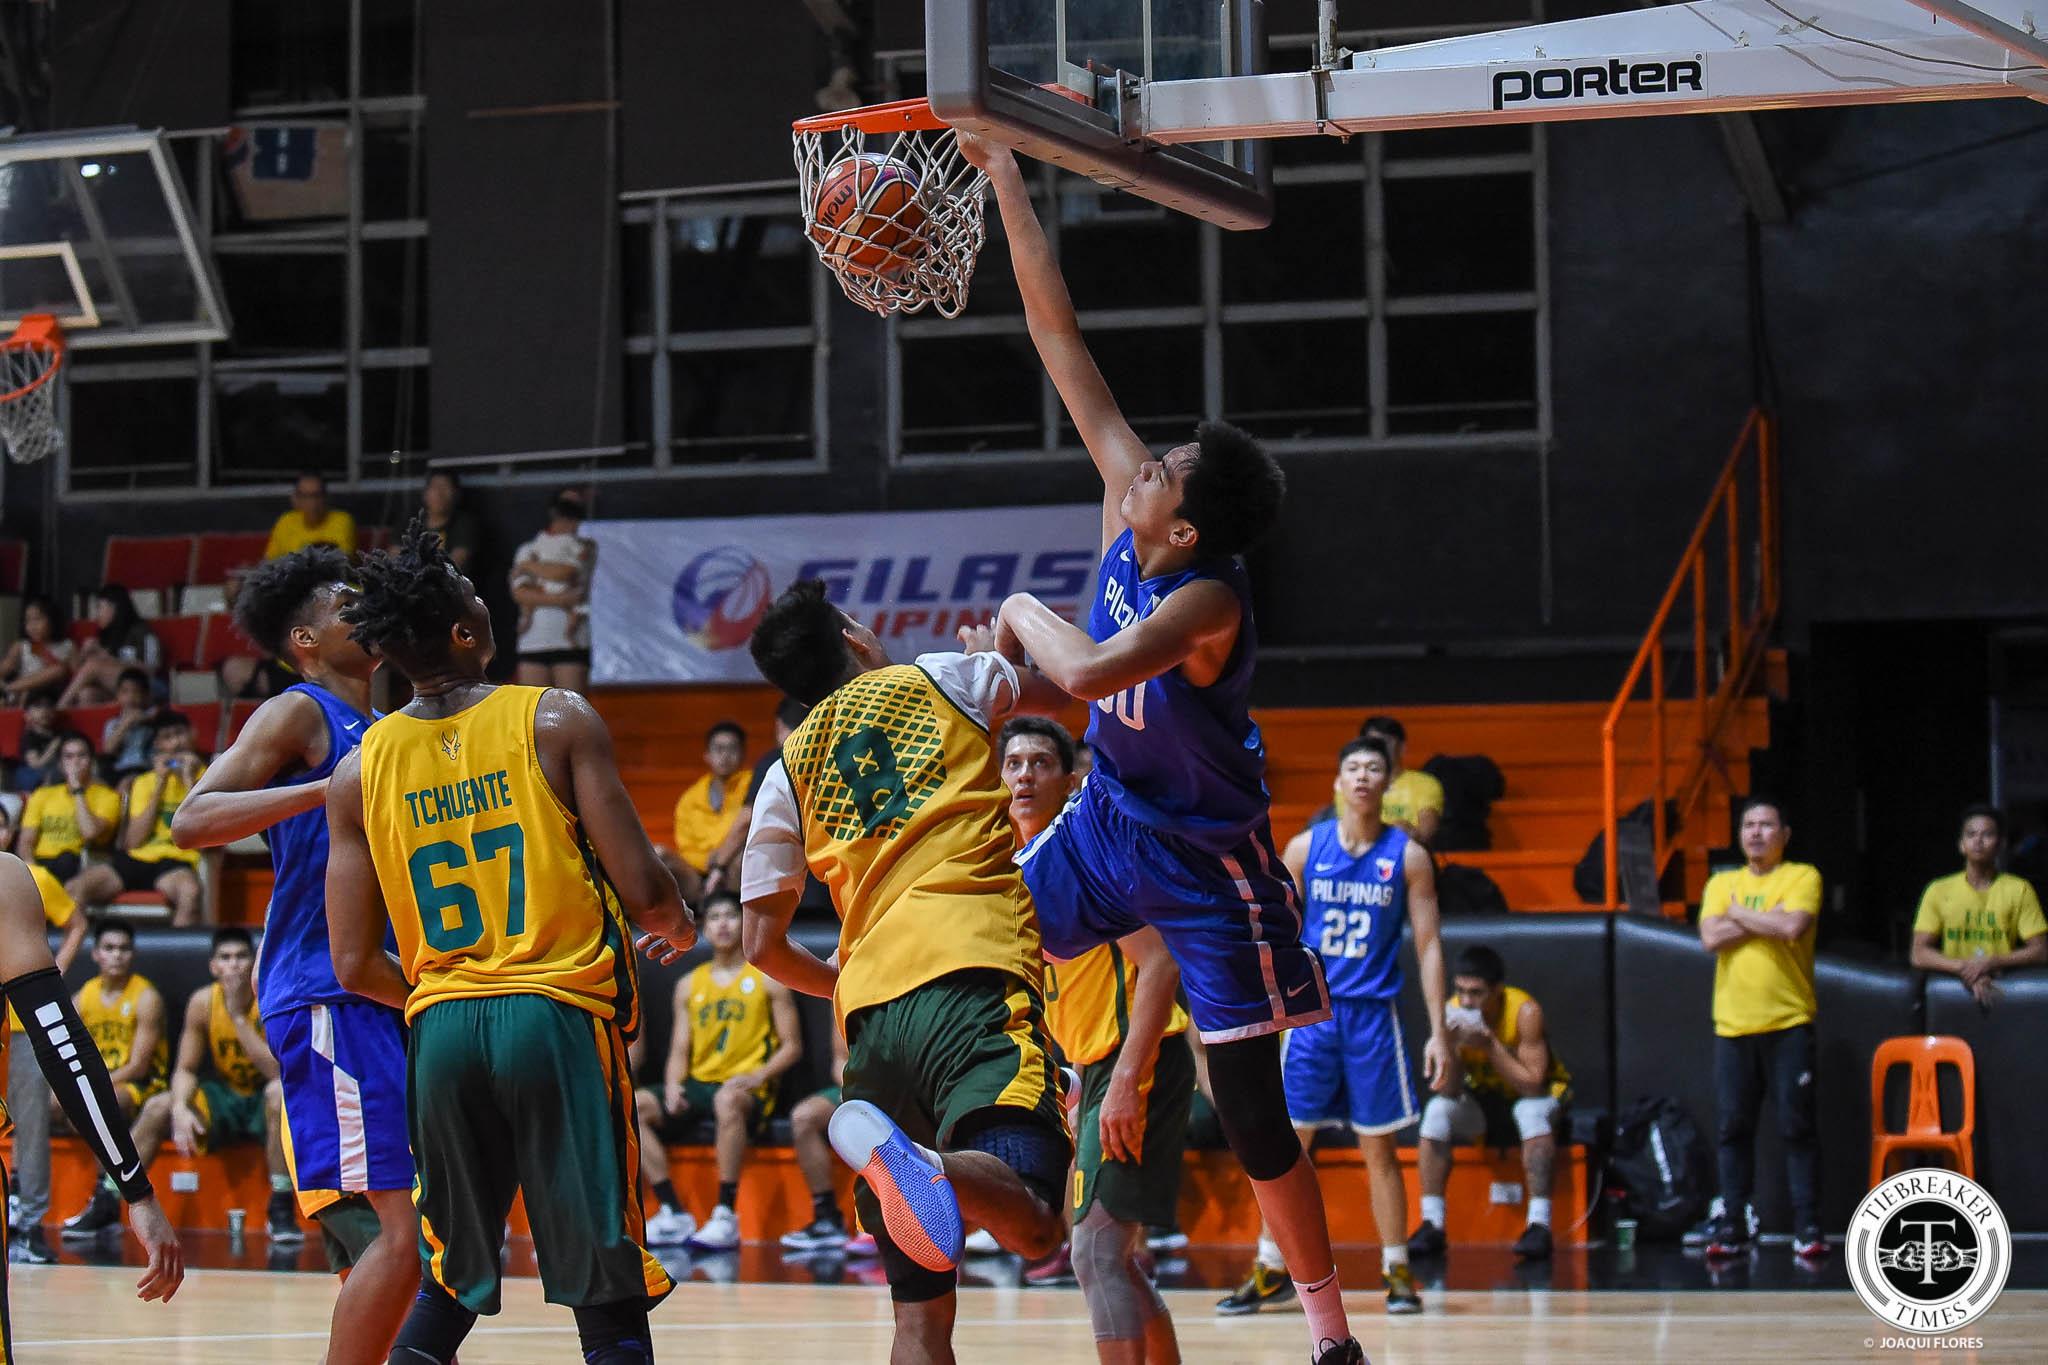 Tiebreaker Times Blatche, Balkman helping Kai Sotto reach NBA dream Basketball News  Renaldo Balkman Kai Sotto Andray Blatche 2020 Dubai International Basketball Championship